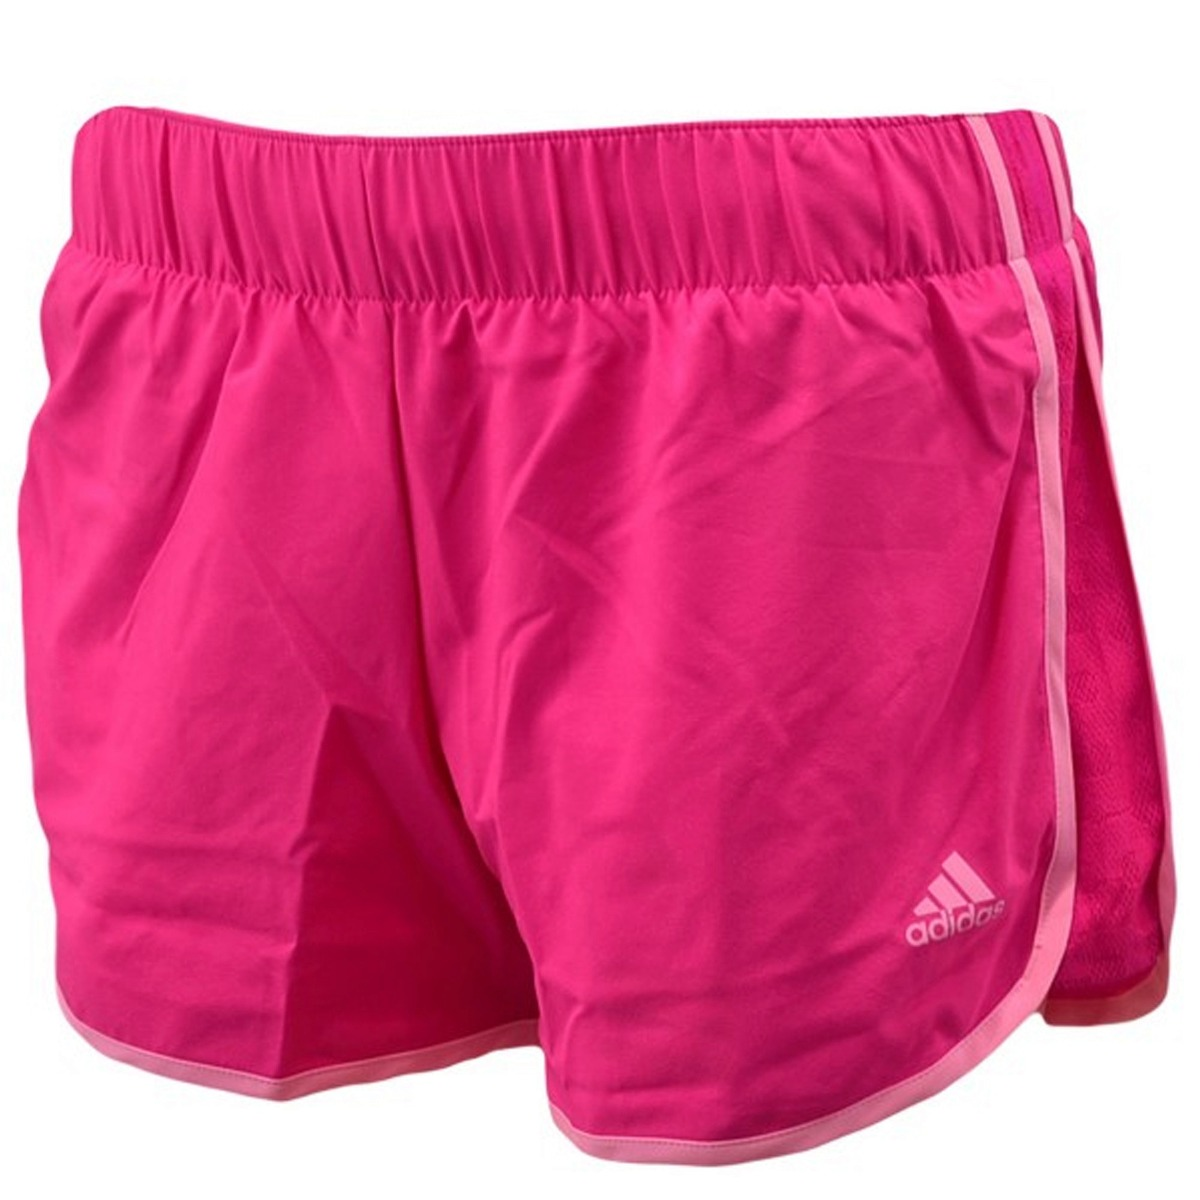 Short Para Correr M10 Running adidas Mujer Ai8116 -   199.00 en ... 91e11c98f4645